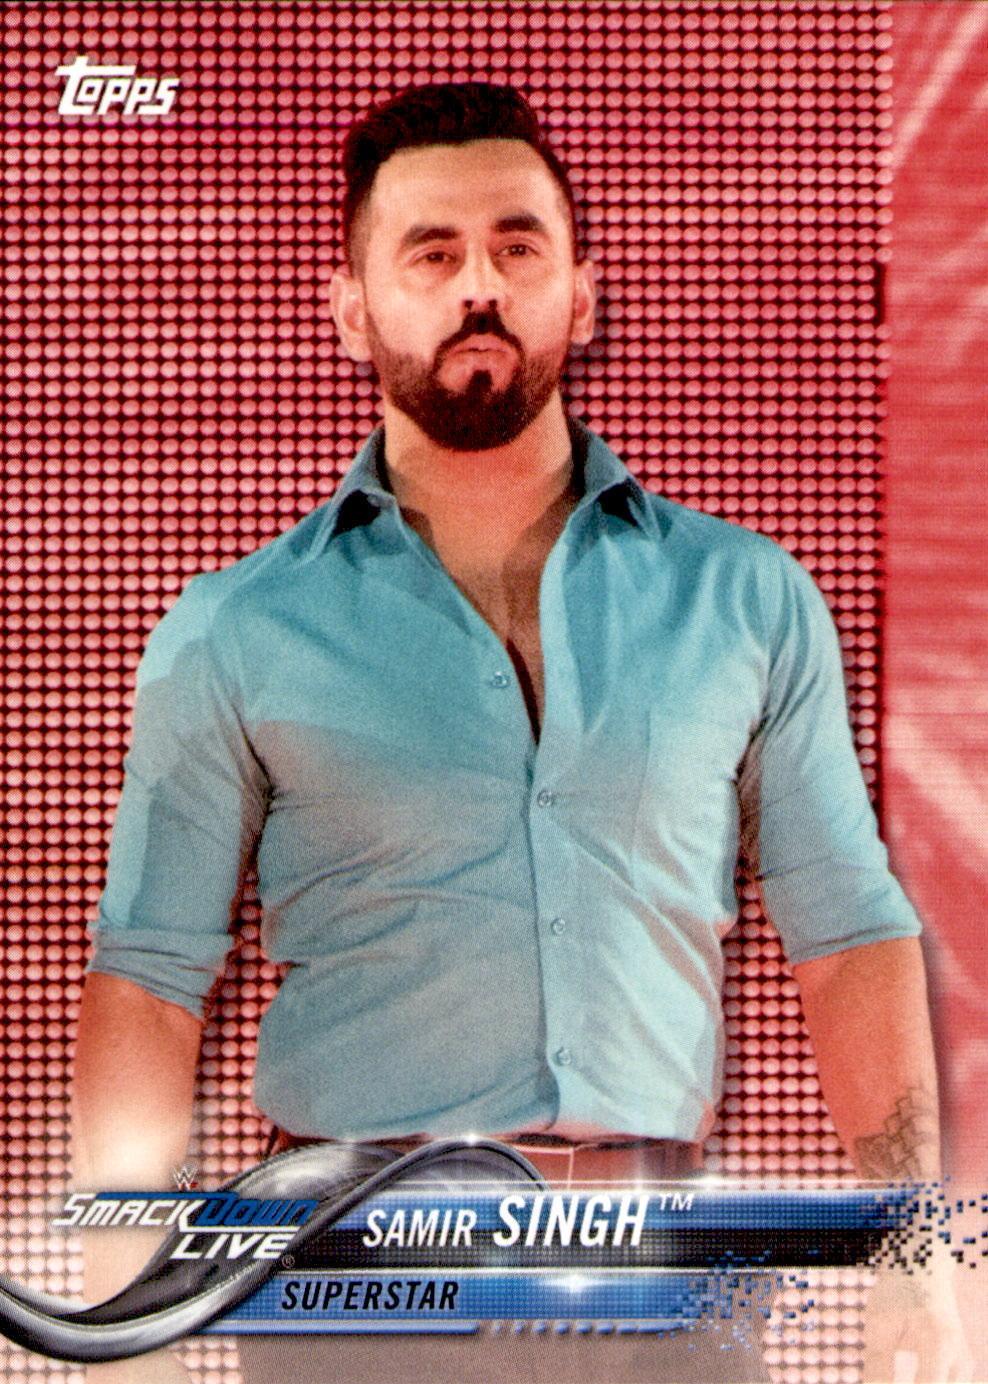 2018 WWE Wrestling Cards (Topps) Samir Singh (No.81)